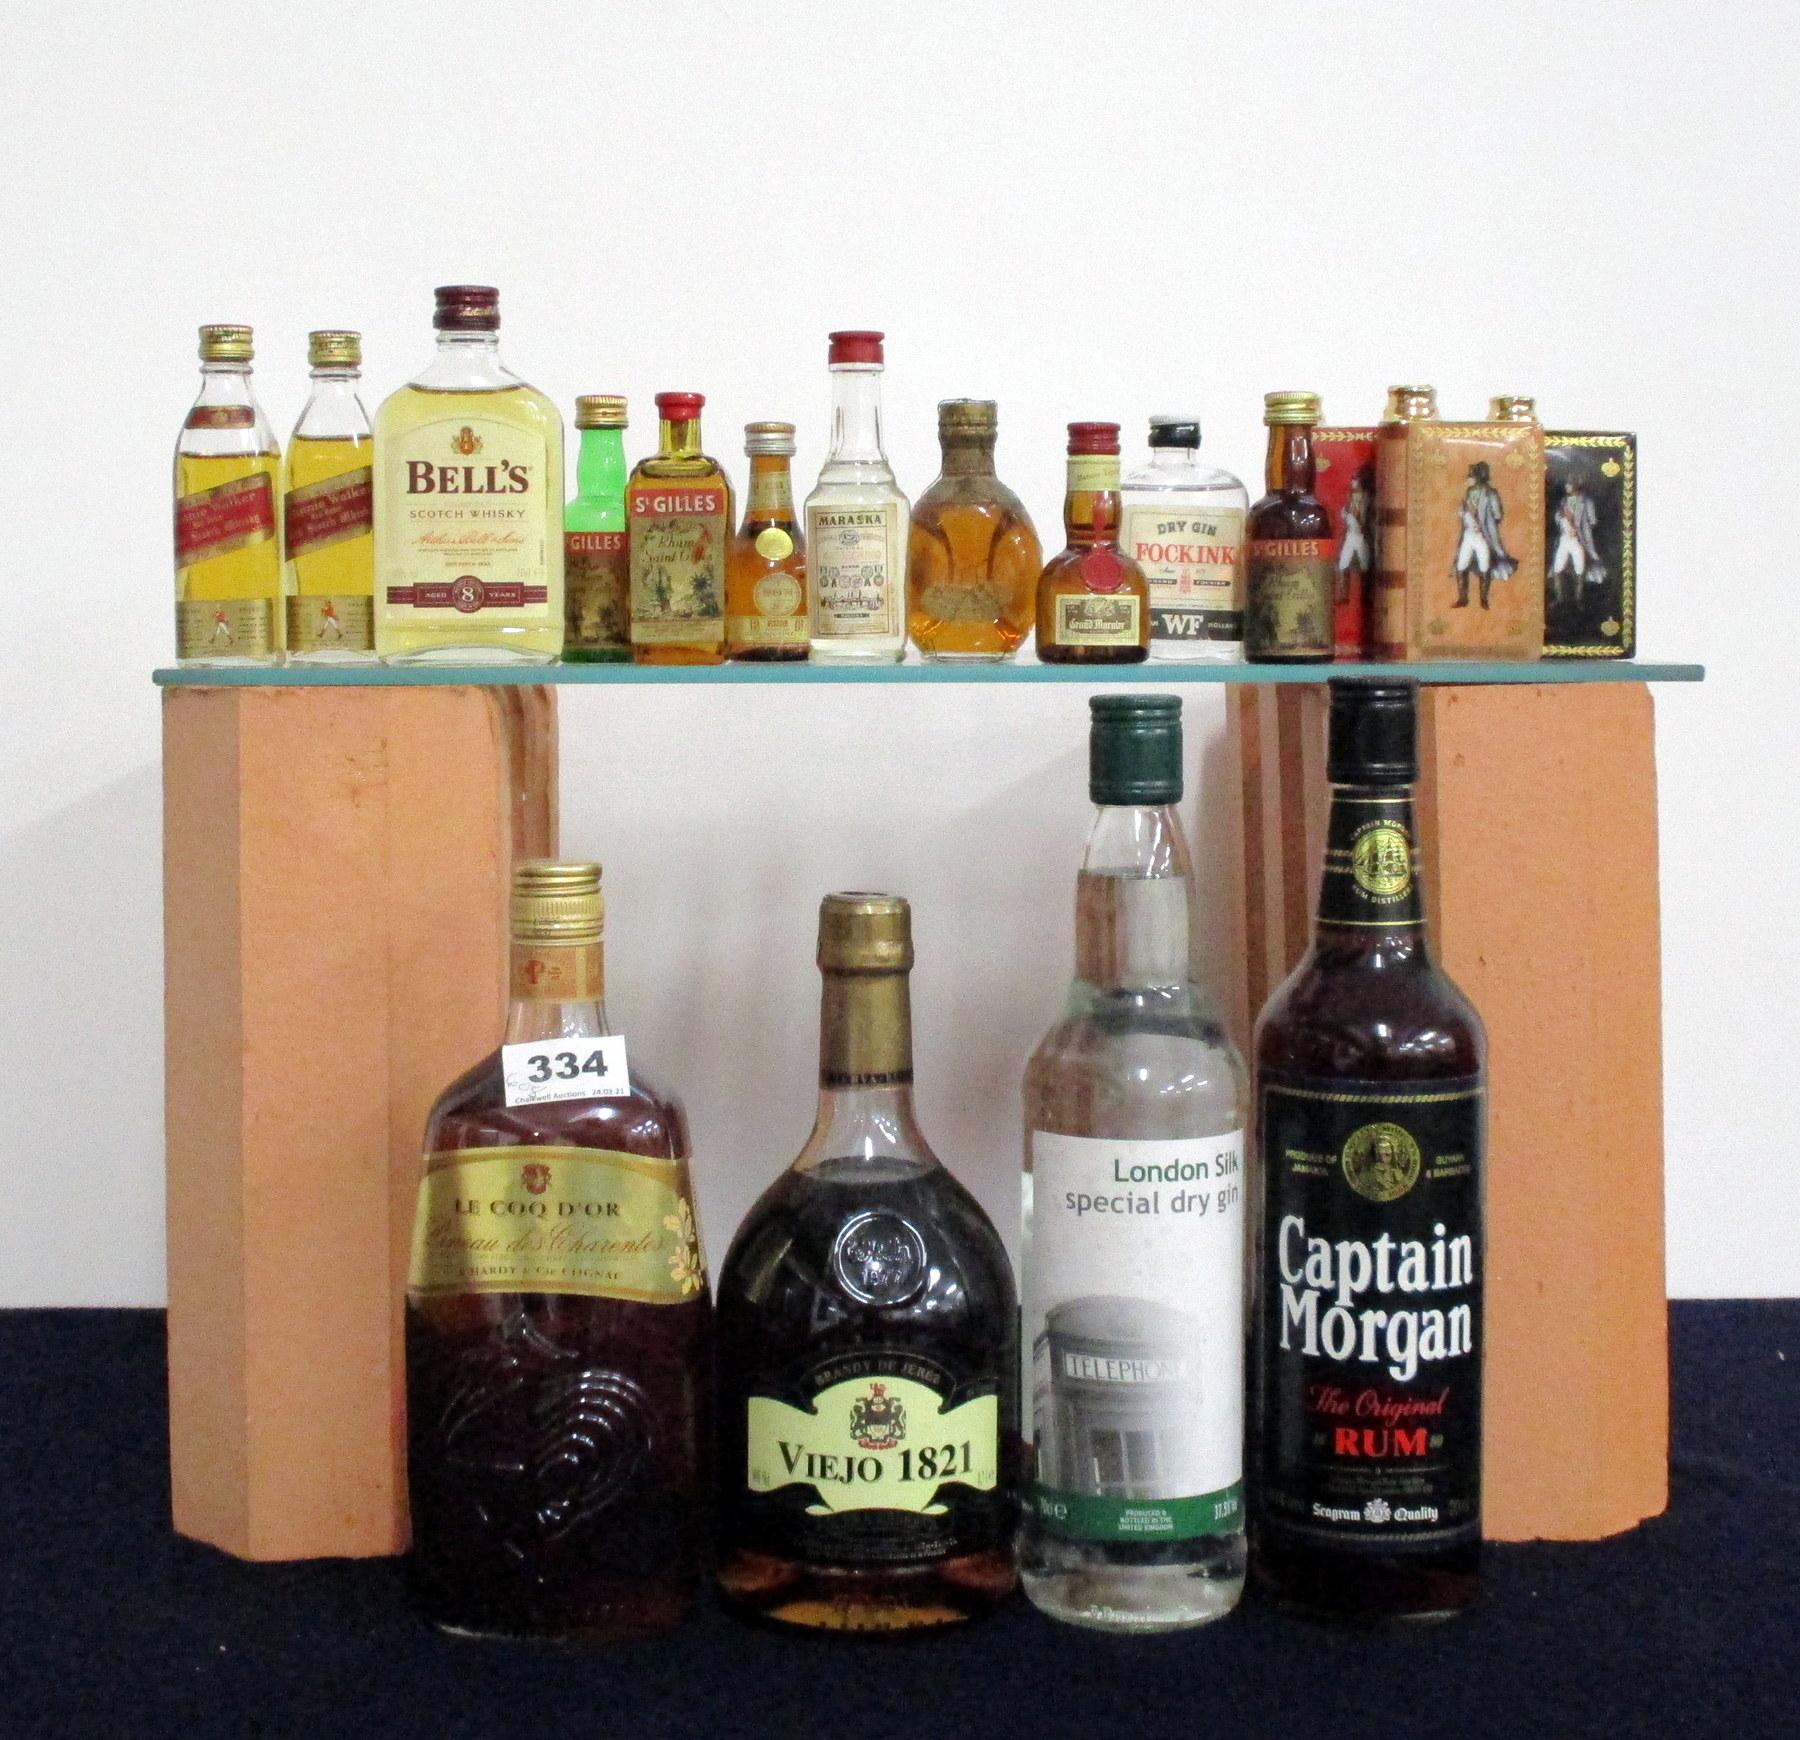 1 70-cl bt Captain Morgan The Original Rum 40% 1 70 cl bt London Silk Special Dry Gin 37.5% 1 75